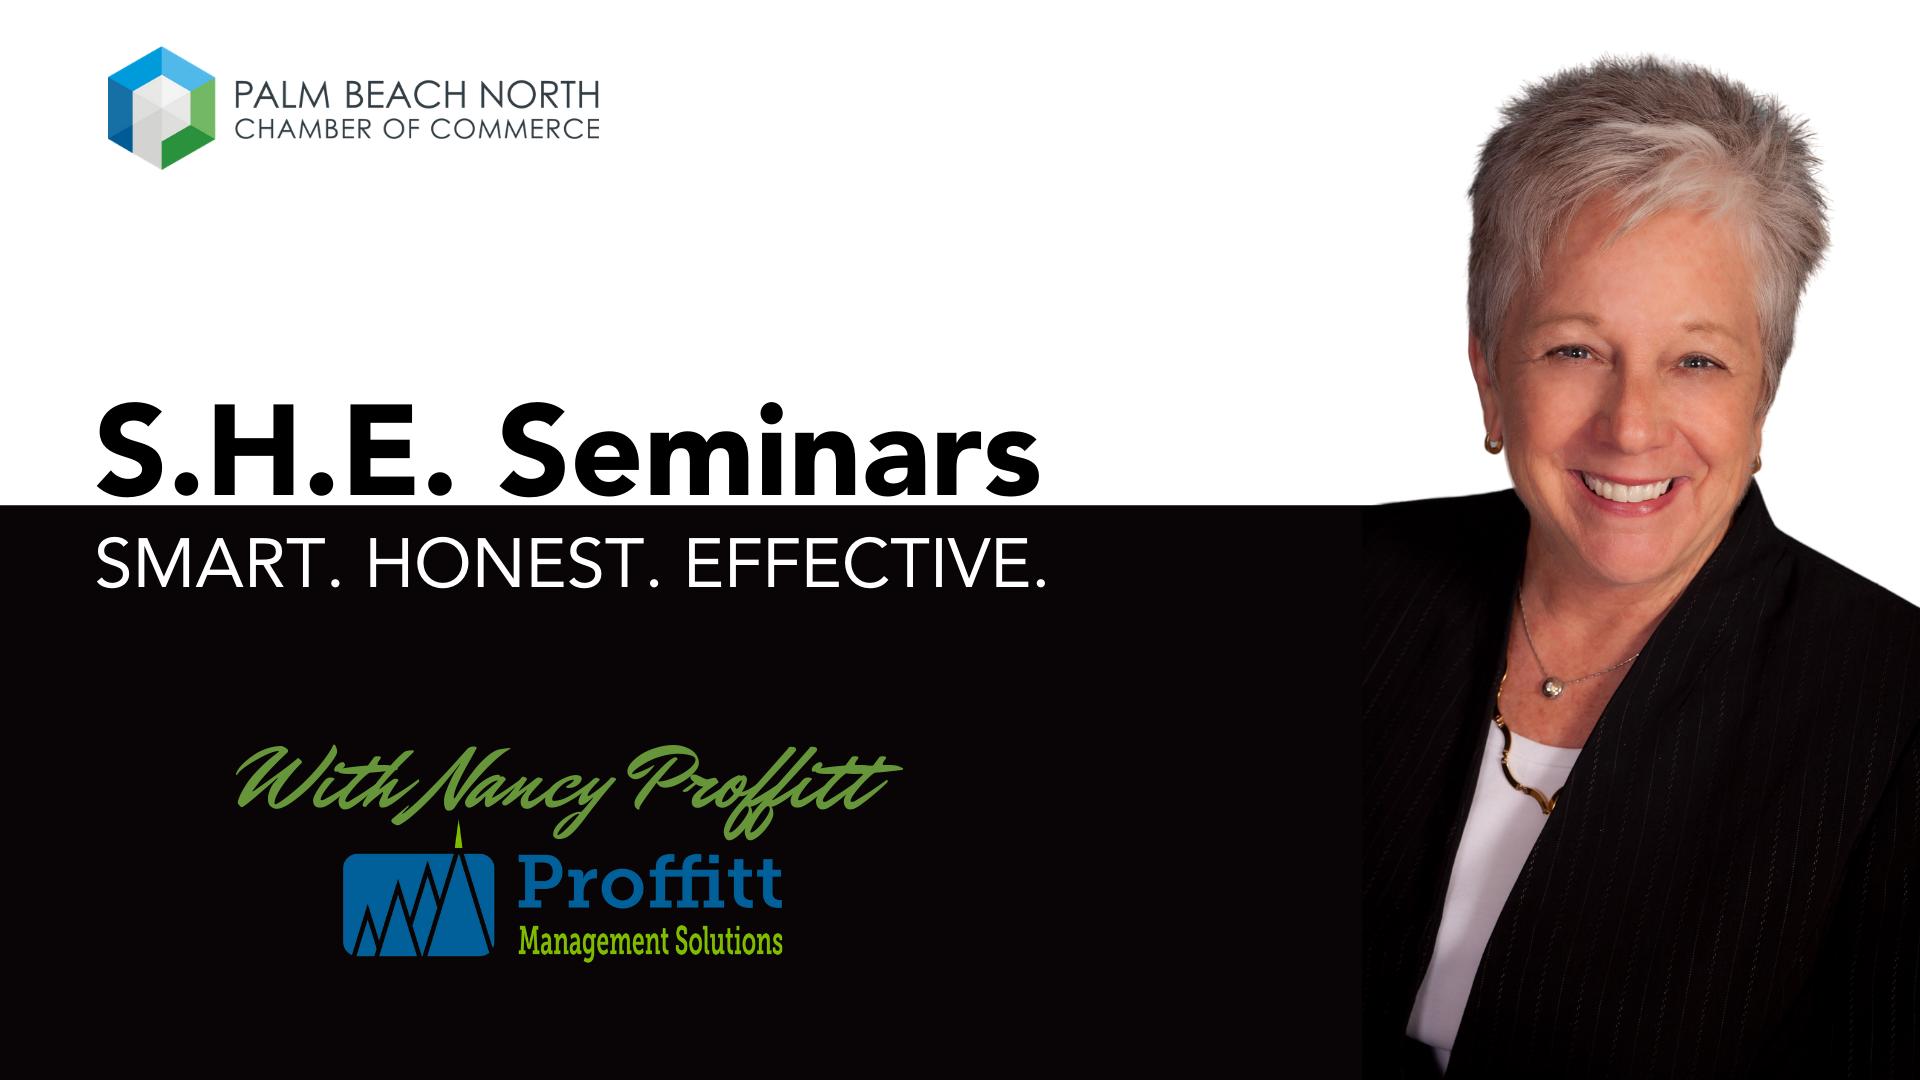 S.H.E. Seminars - Smart. Honest. Effective.